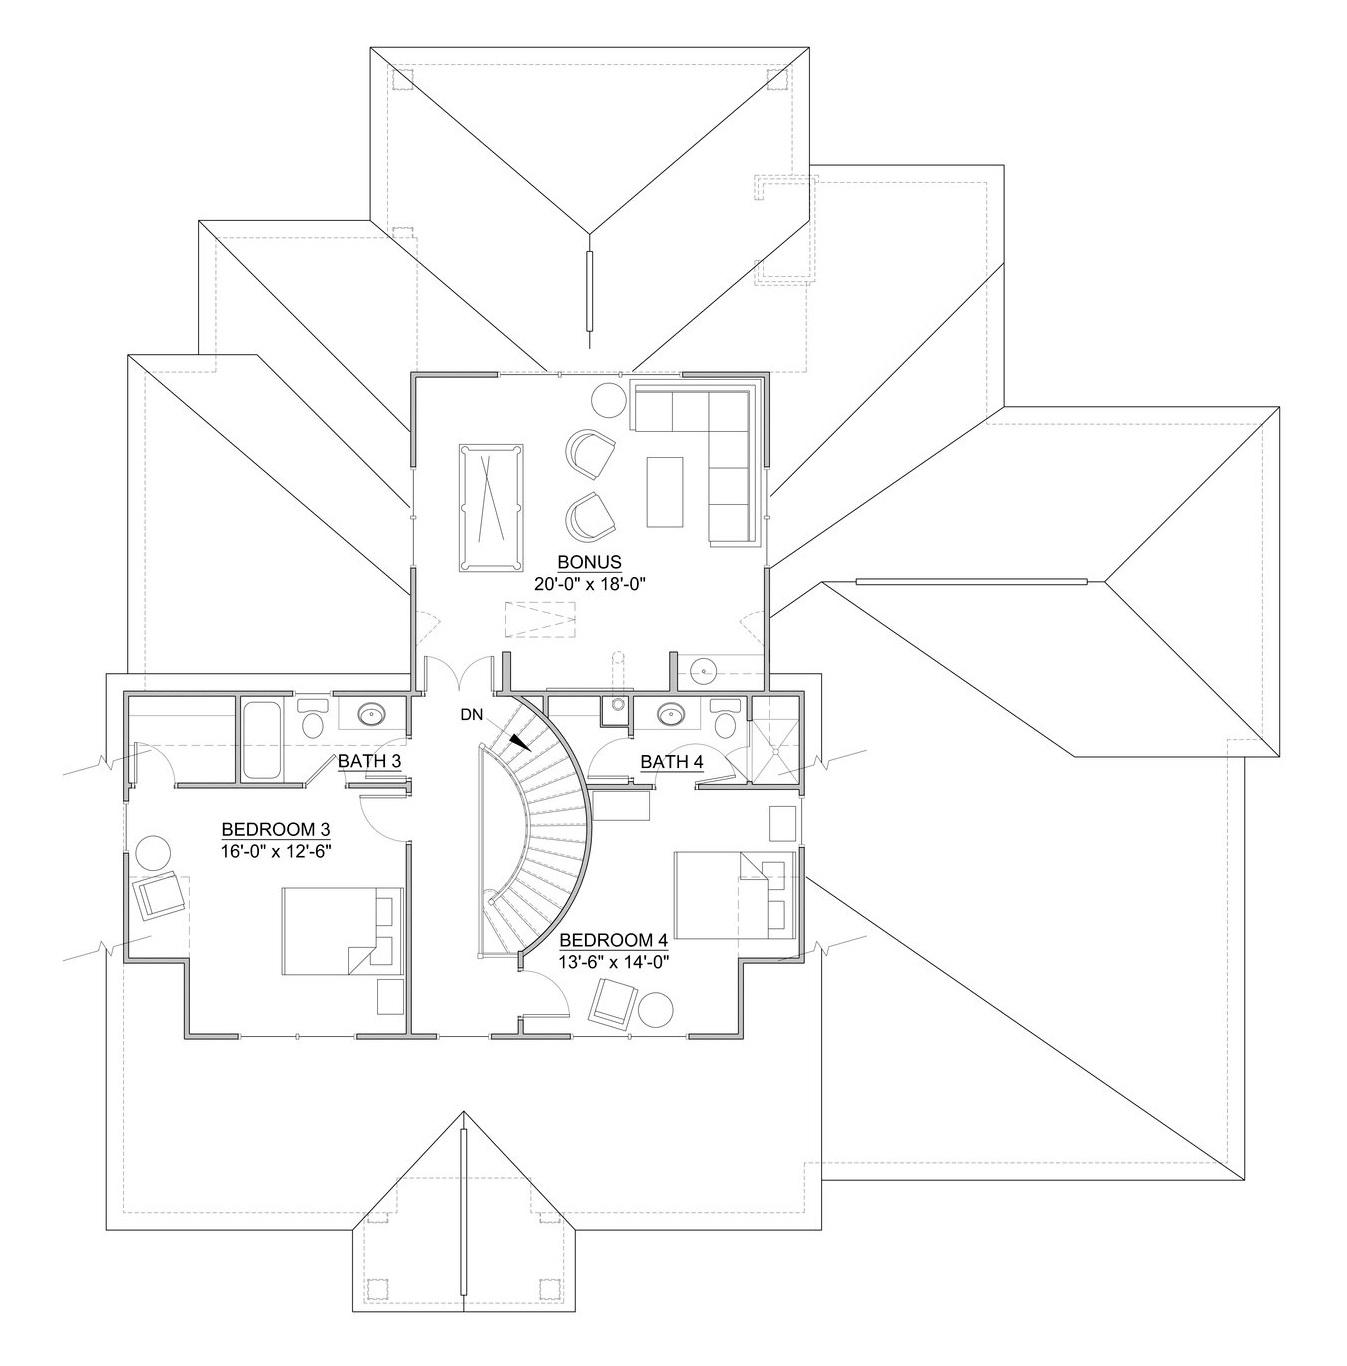 Riverchase_Christman A CRAWL_(3) Second Floor Plan [24x36].jpg